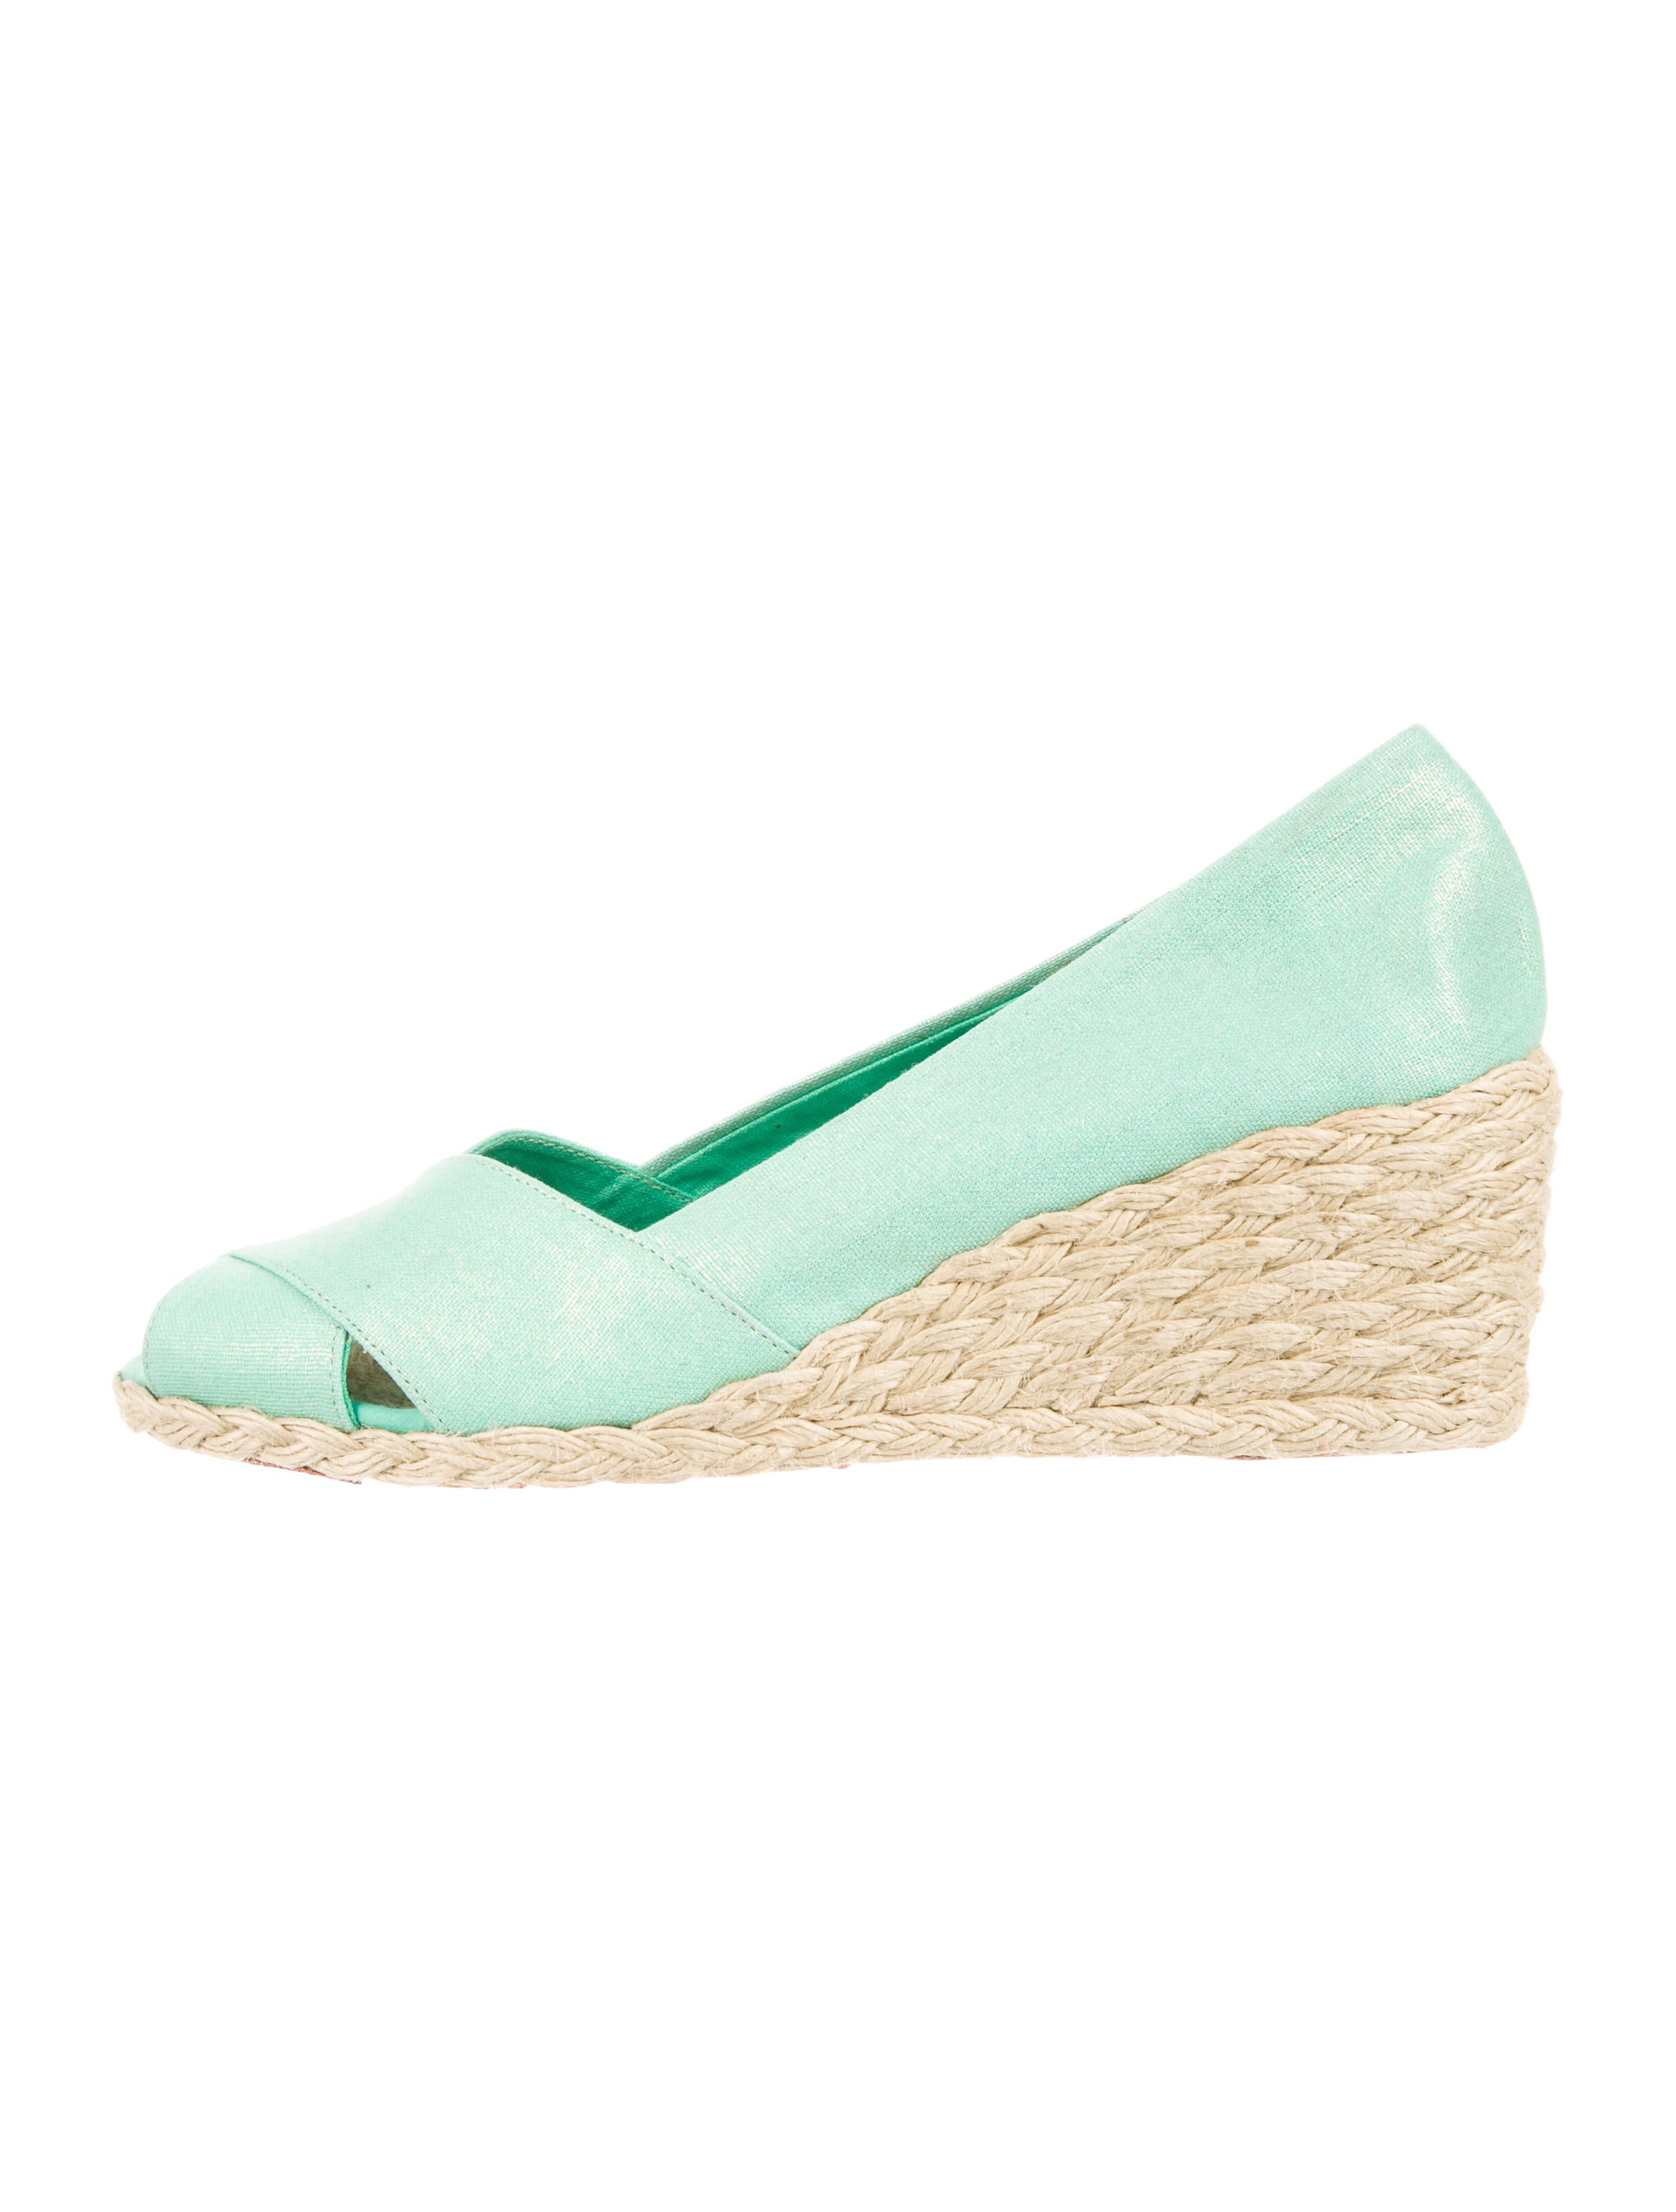 8b986b67f06 Lauren Ralph Lauren Cecilia Espadrille Wedges - Shoes - WLRLN20600 ...